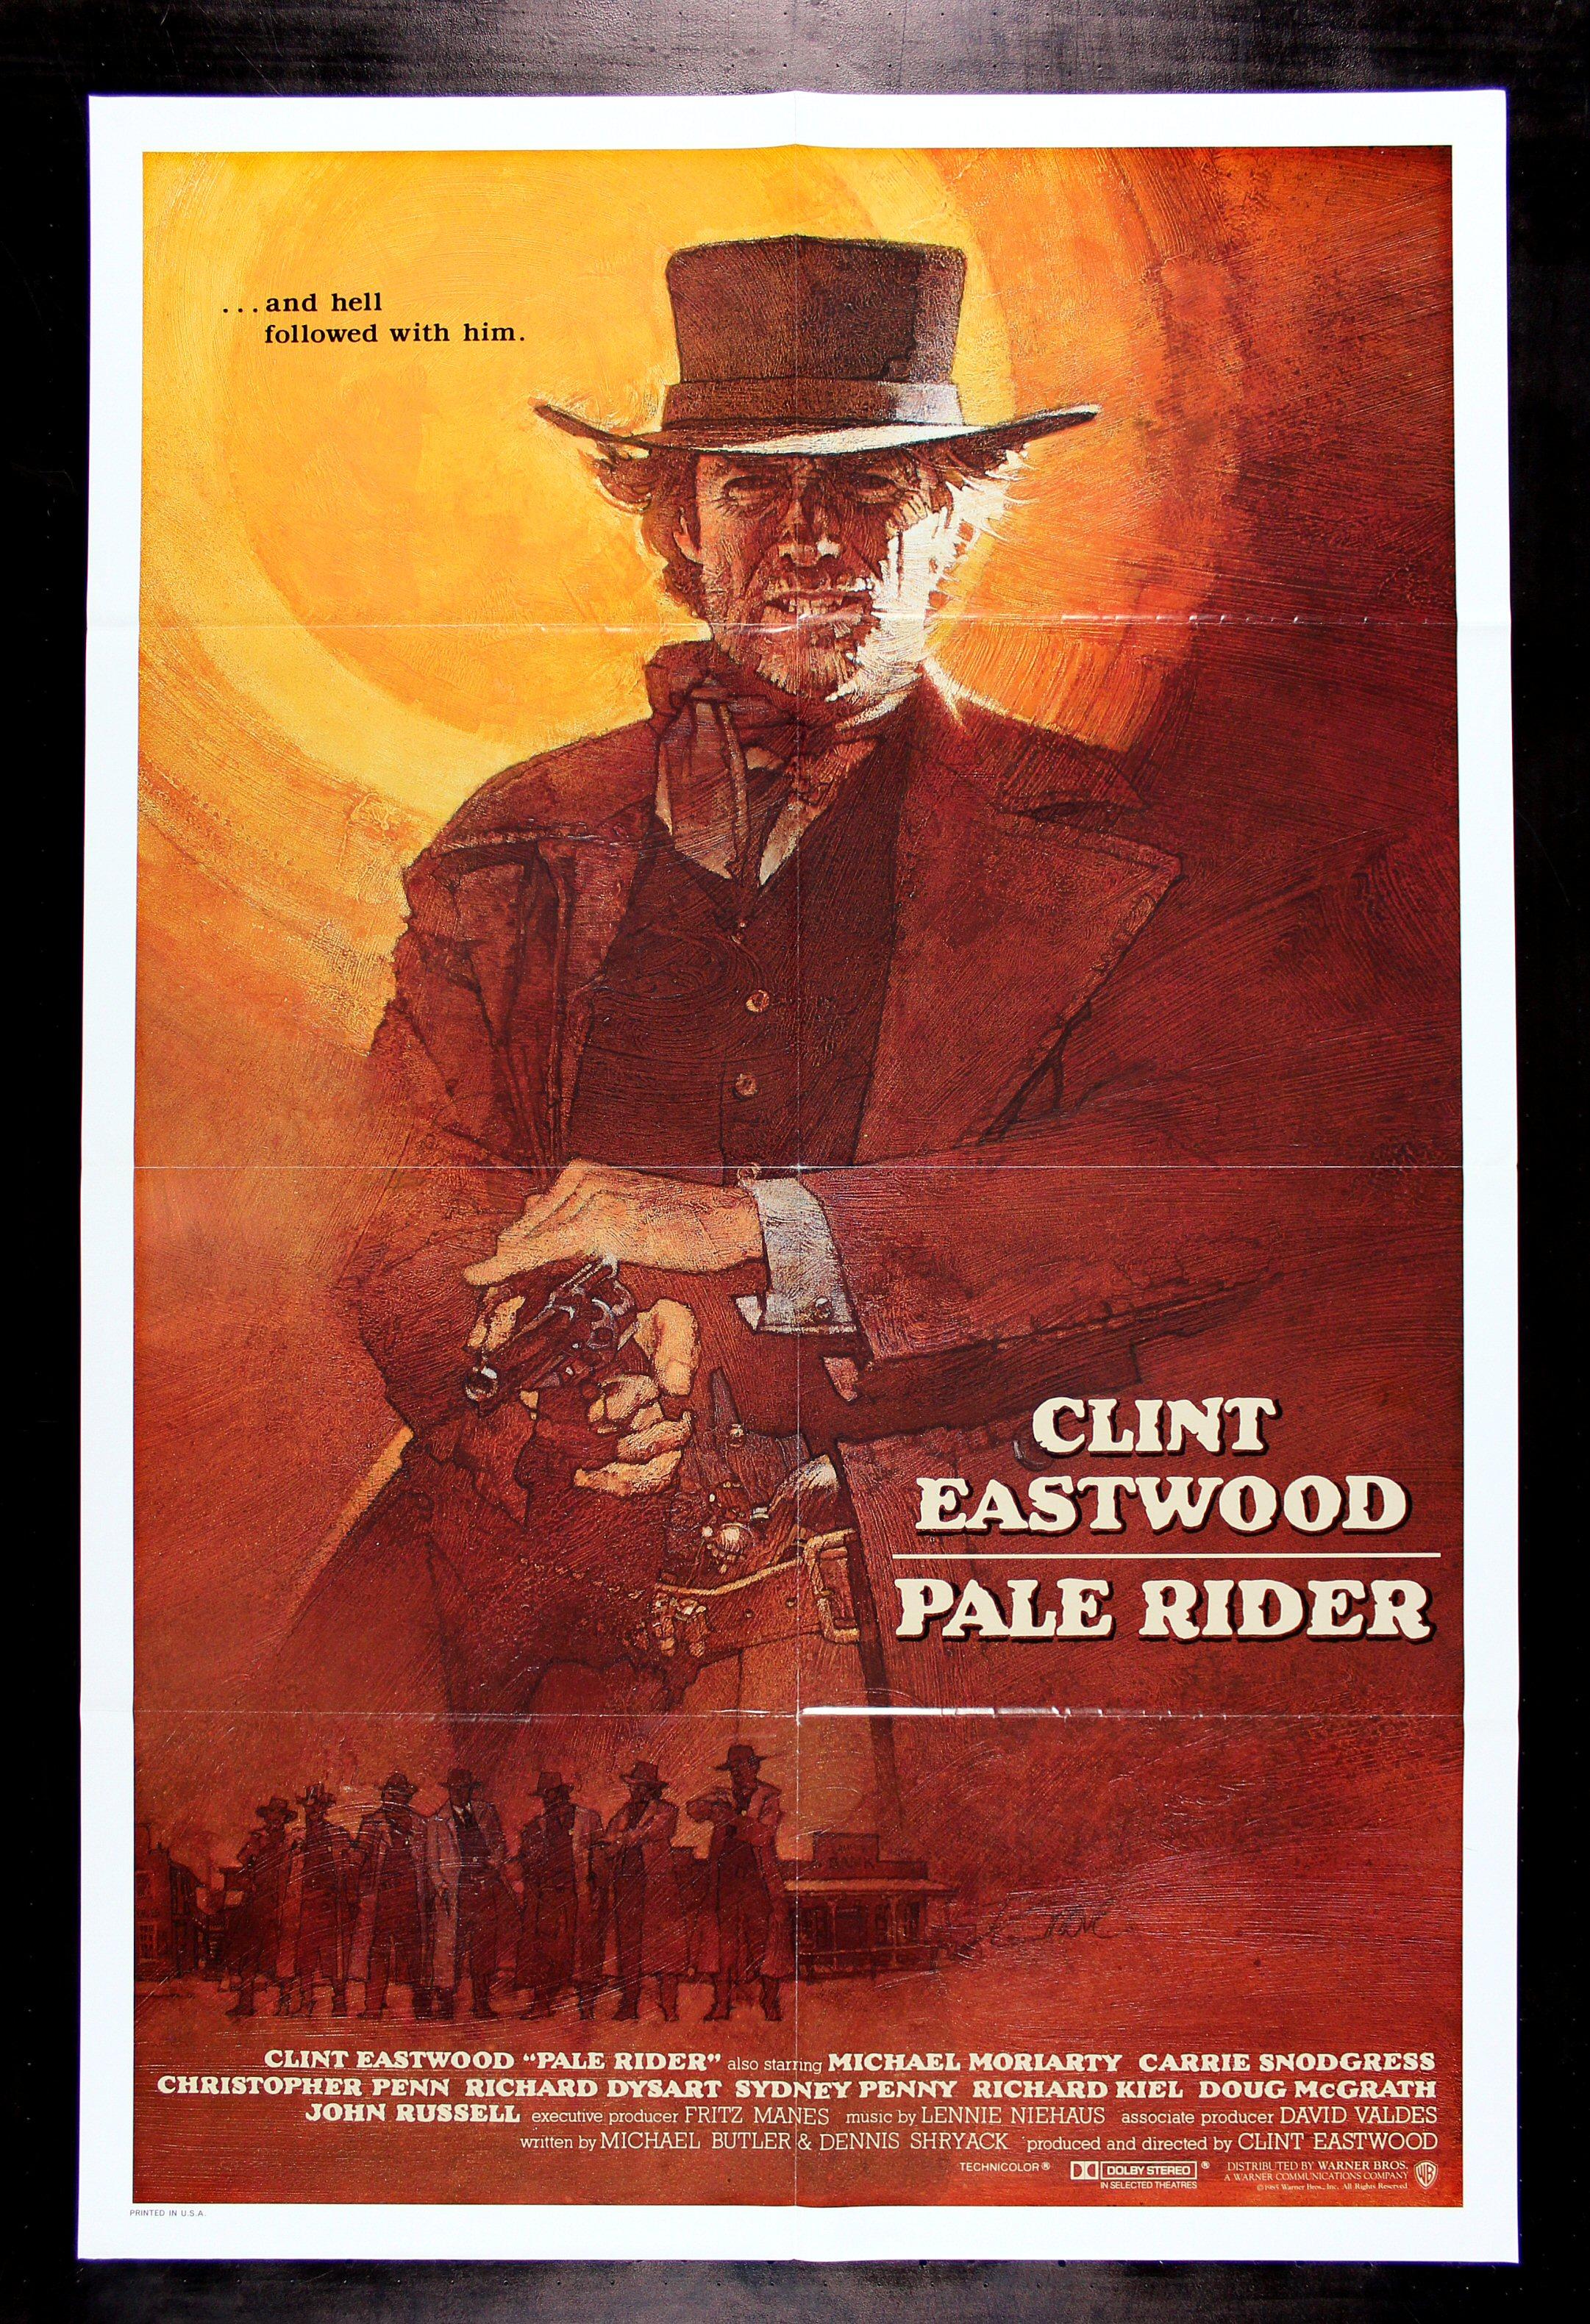 pale rider clint eastwood rare international 1sh western